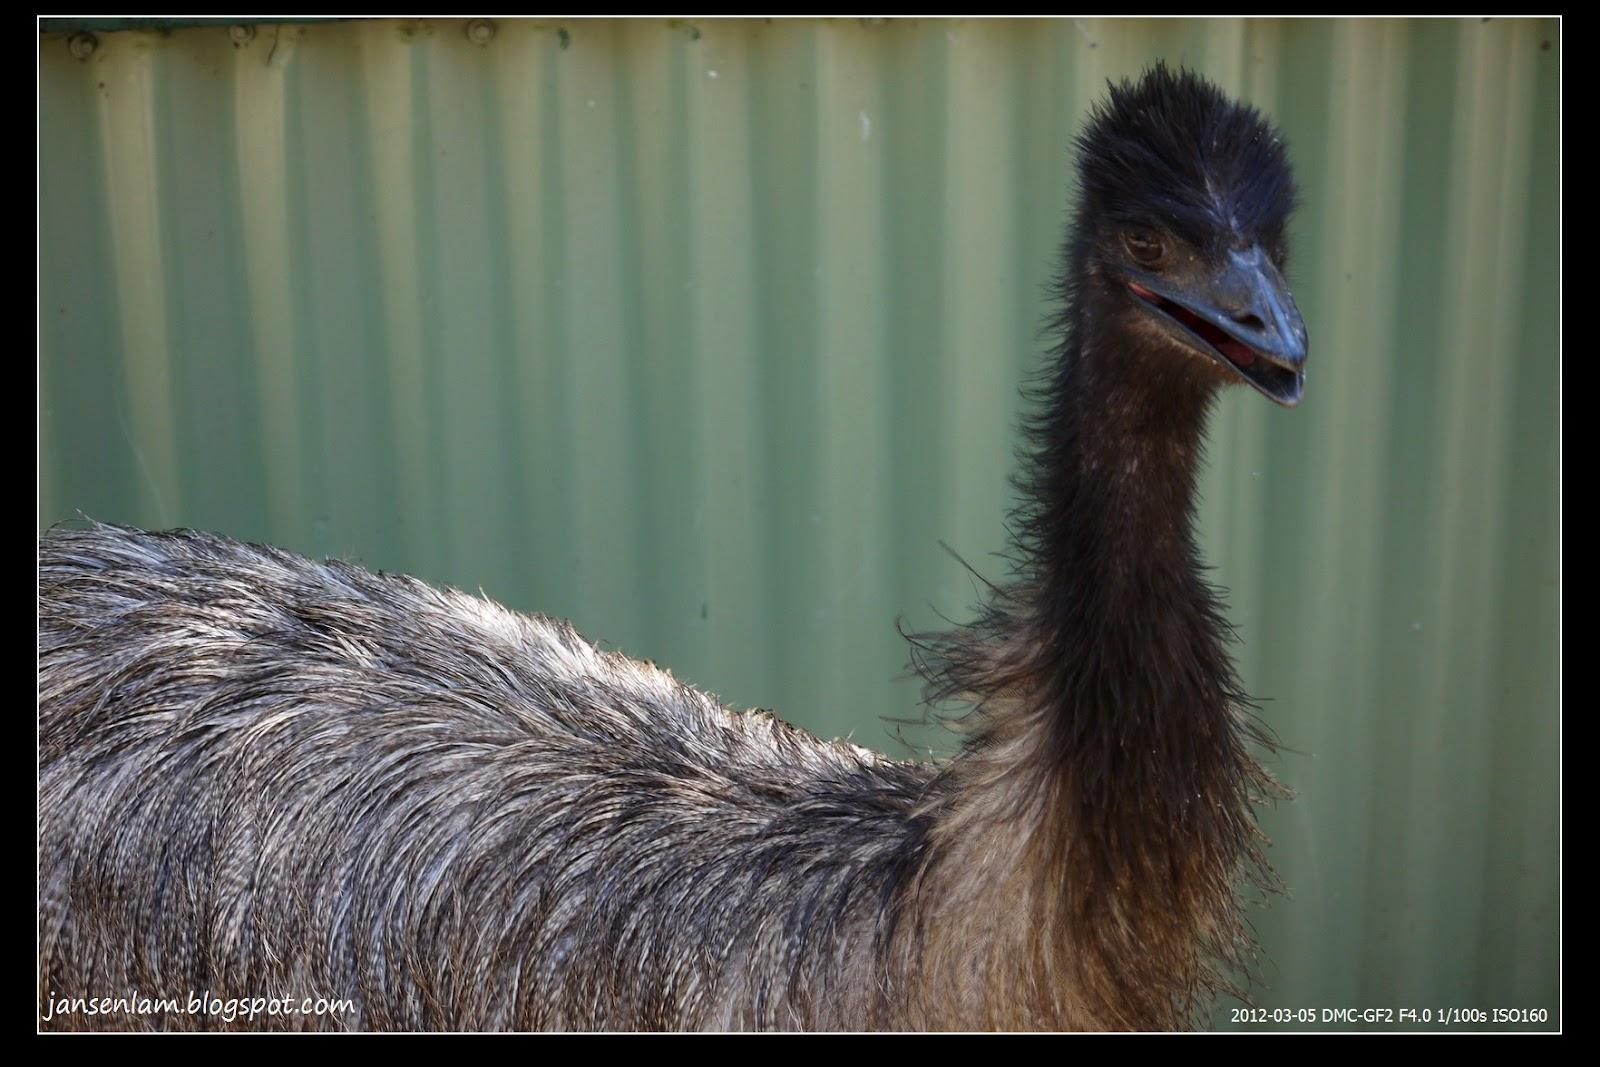 贊臣博一博: Featherdale Wildlife Park